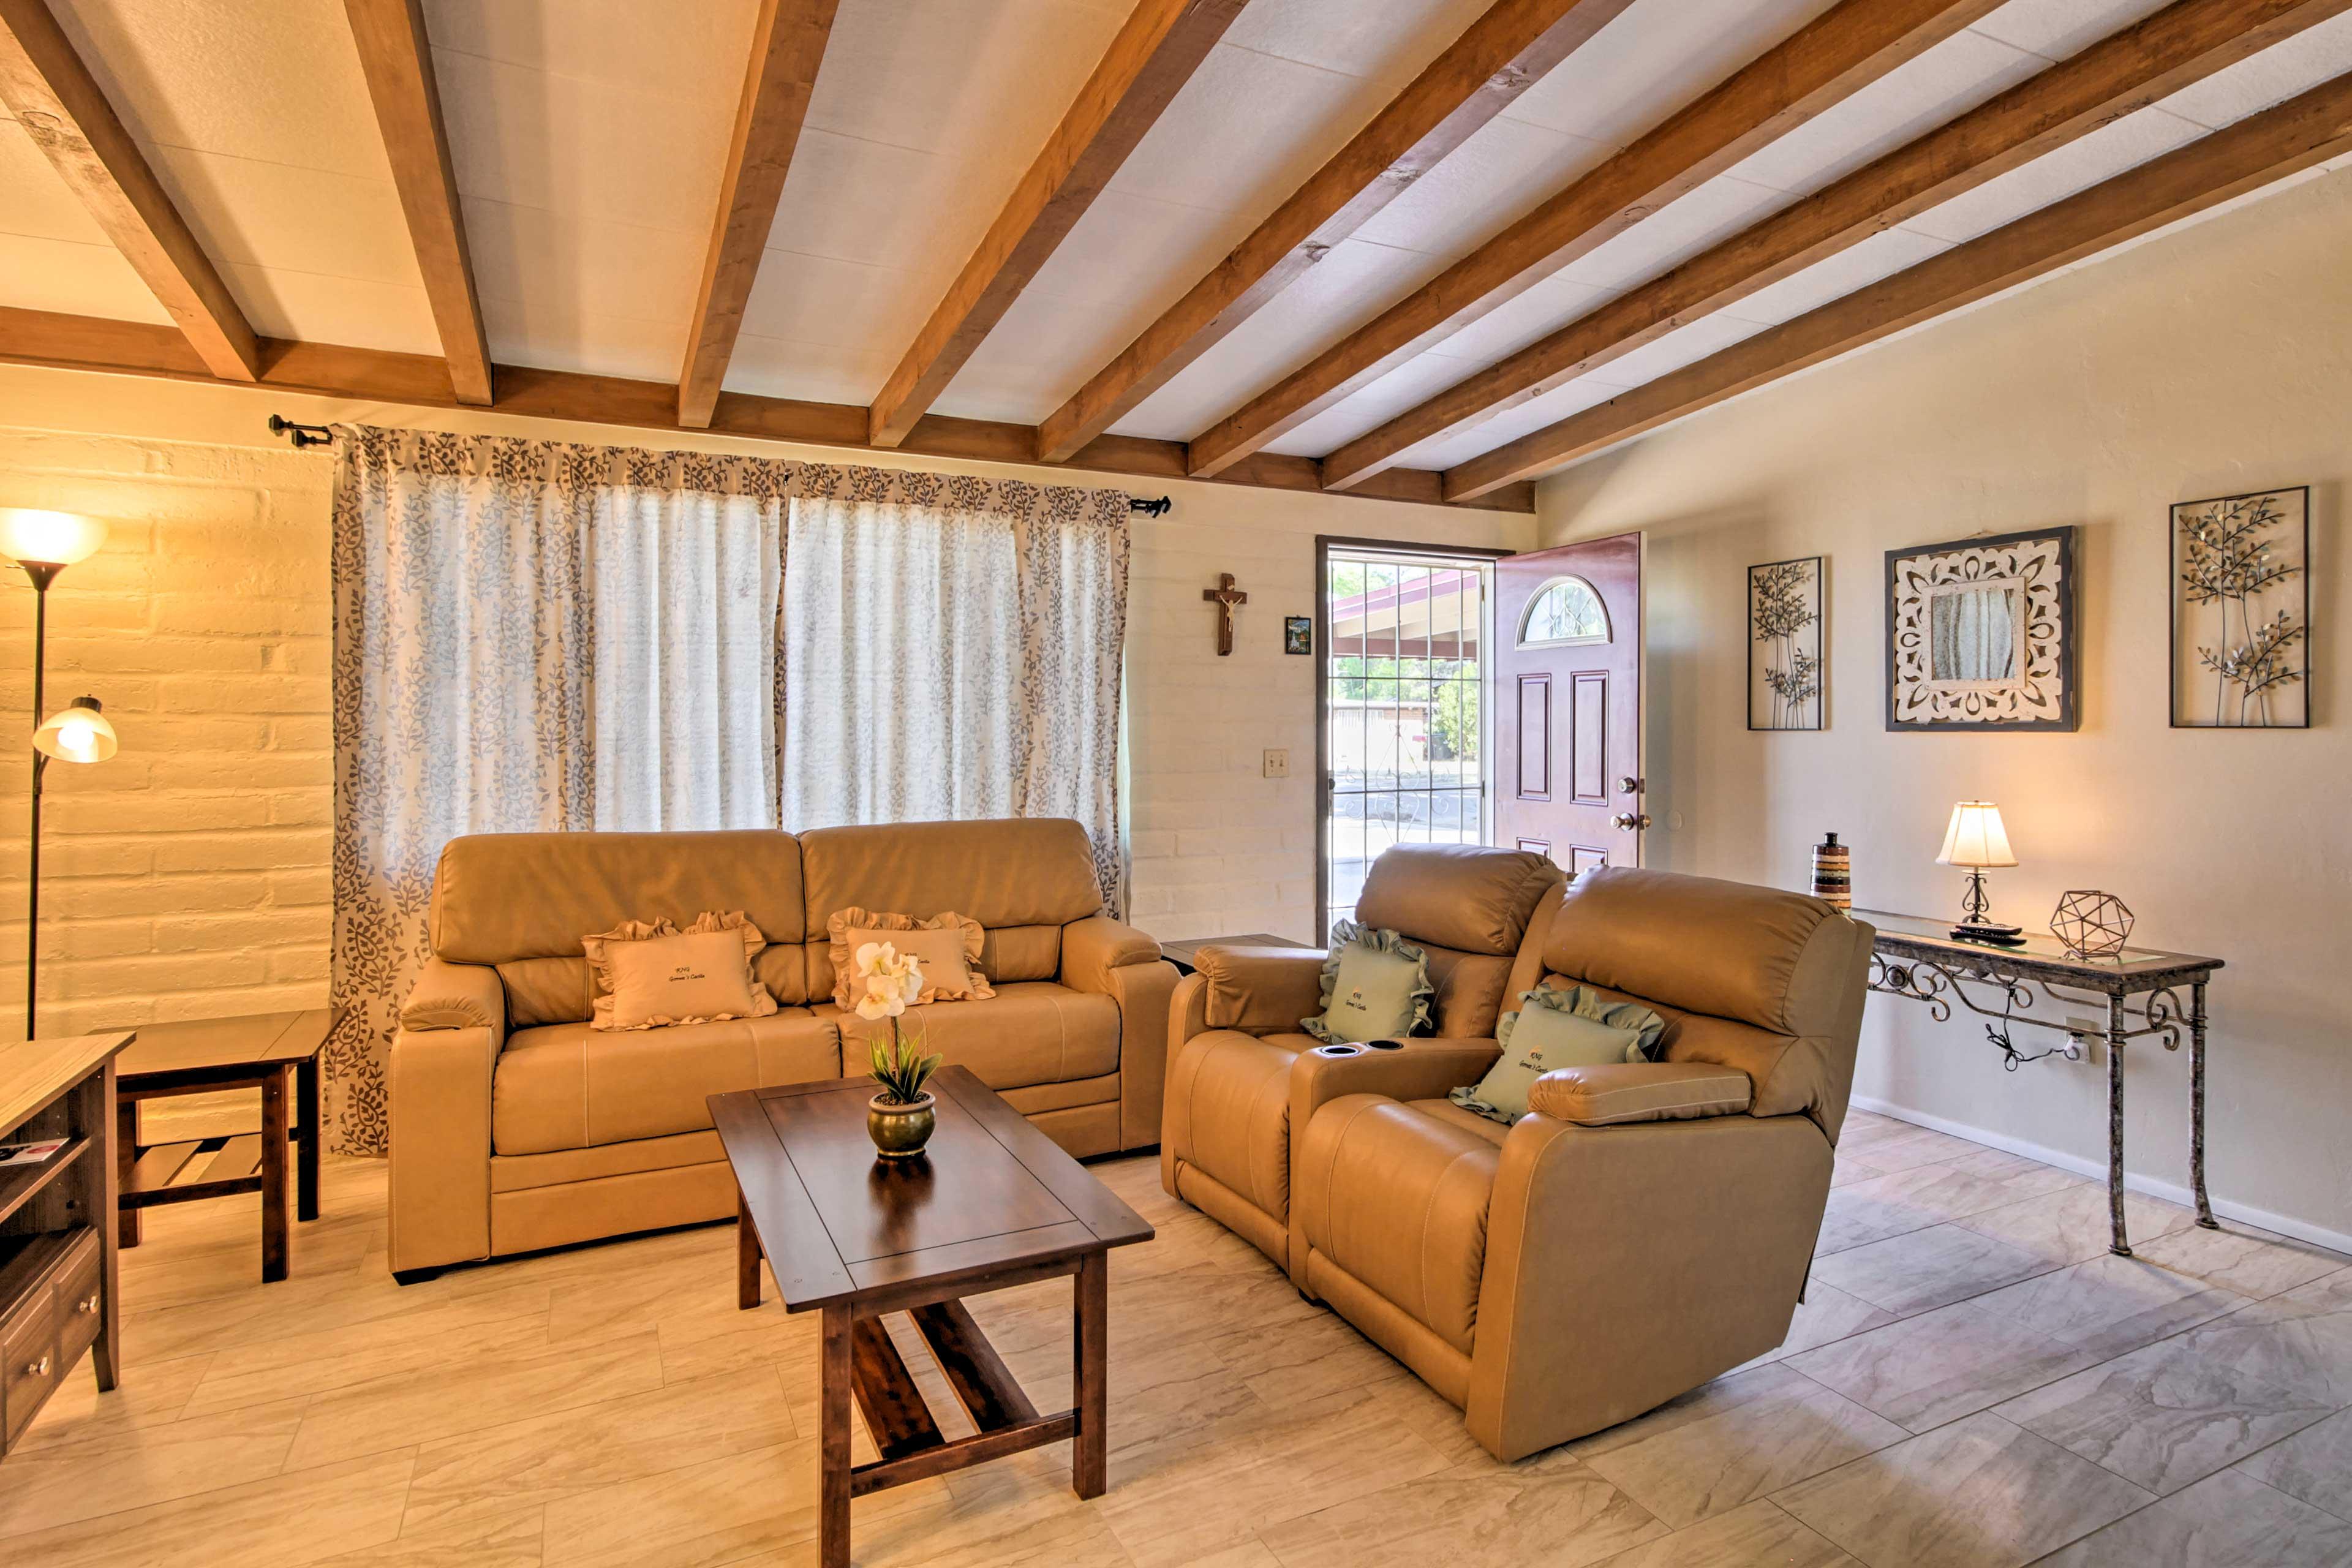 Unwind on the comfortable living room furnishings.